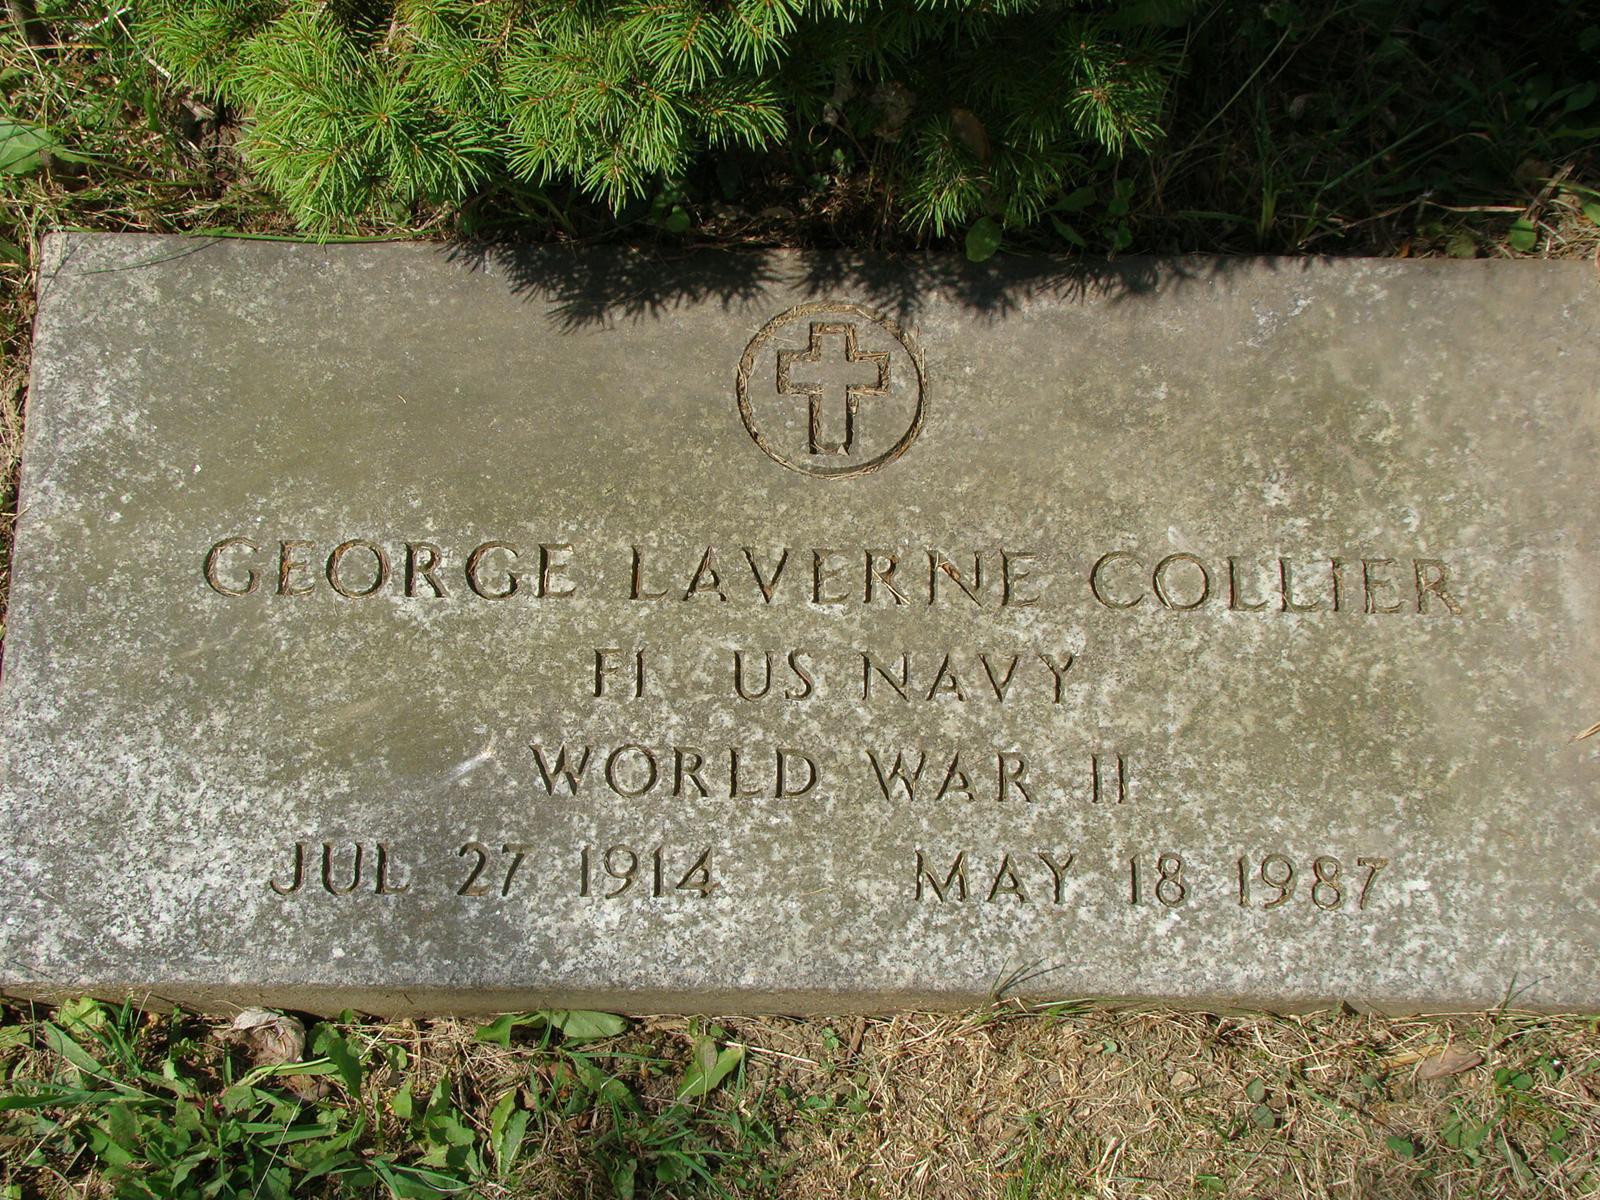 Laverne Collier